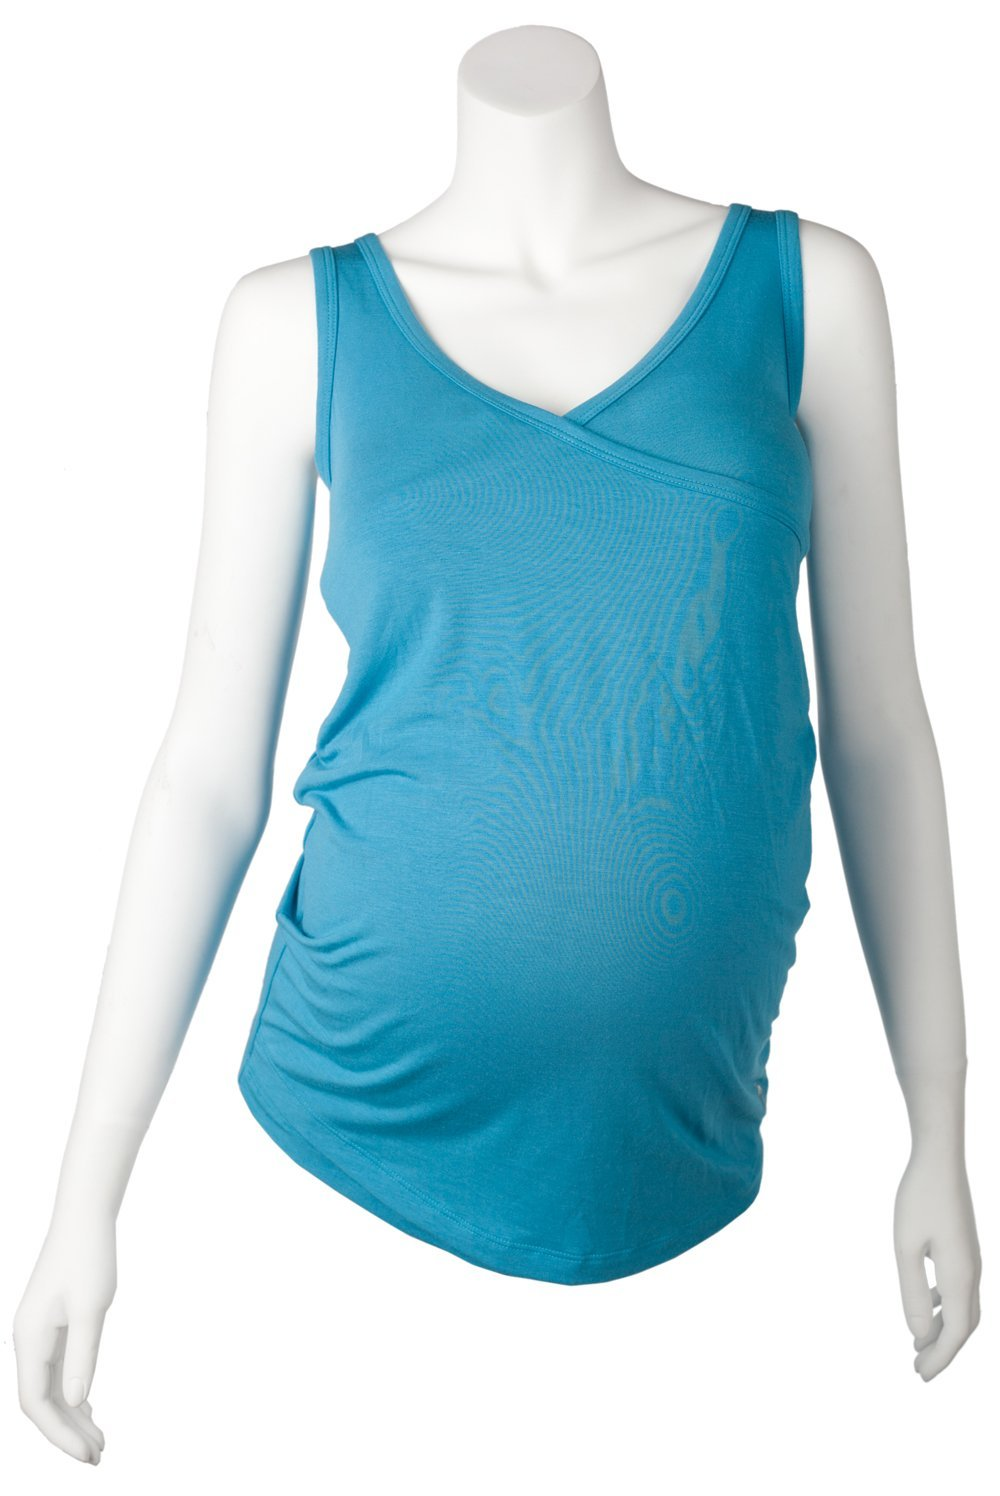 mountain-mama-lumni-maternity-nursing-tank-blue.jpg